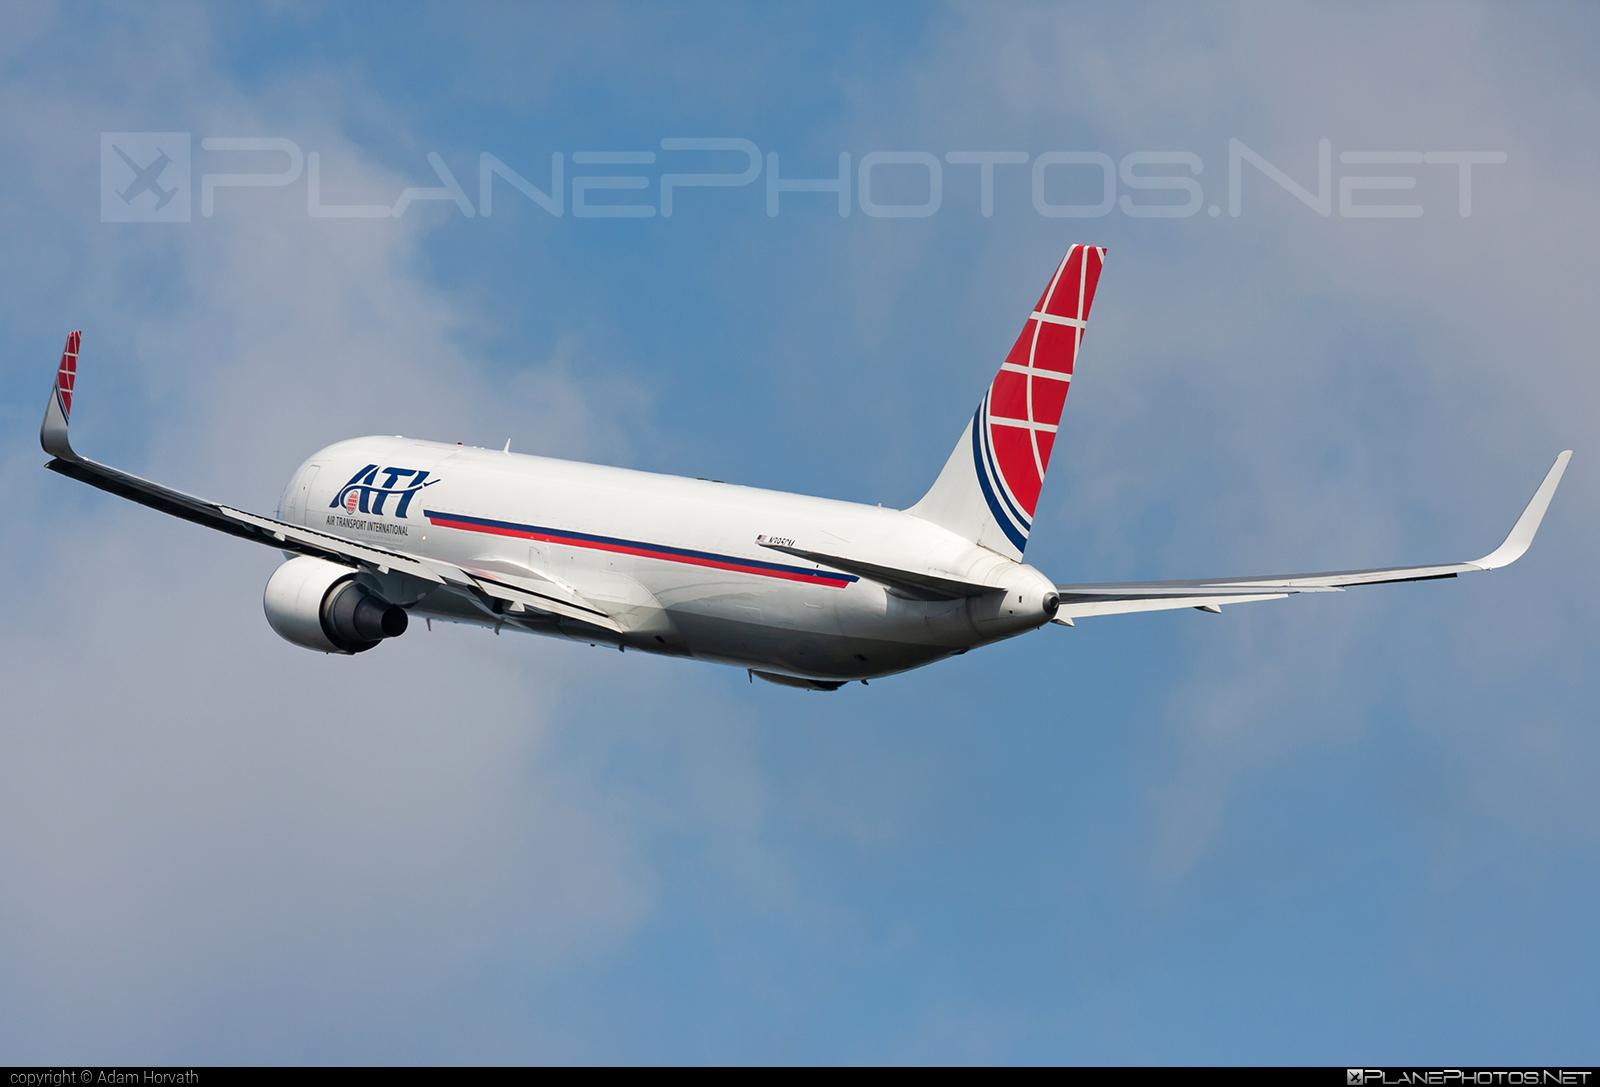 Boeing 767-300BDSF - N395CM operated by Air Transport International (ATI) #b767 #b767300bdsf #b767bdsf #bedekspecialfreighter #boeing #boeing767